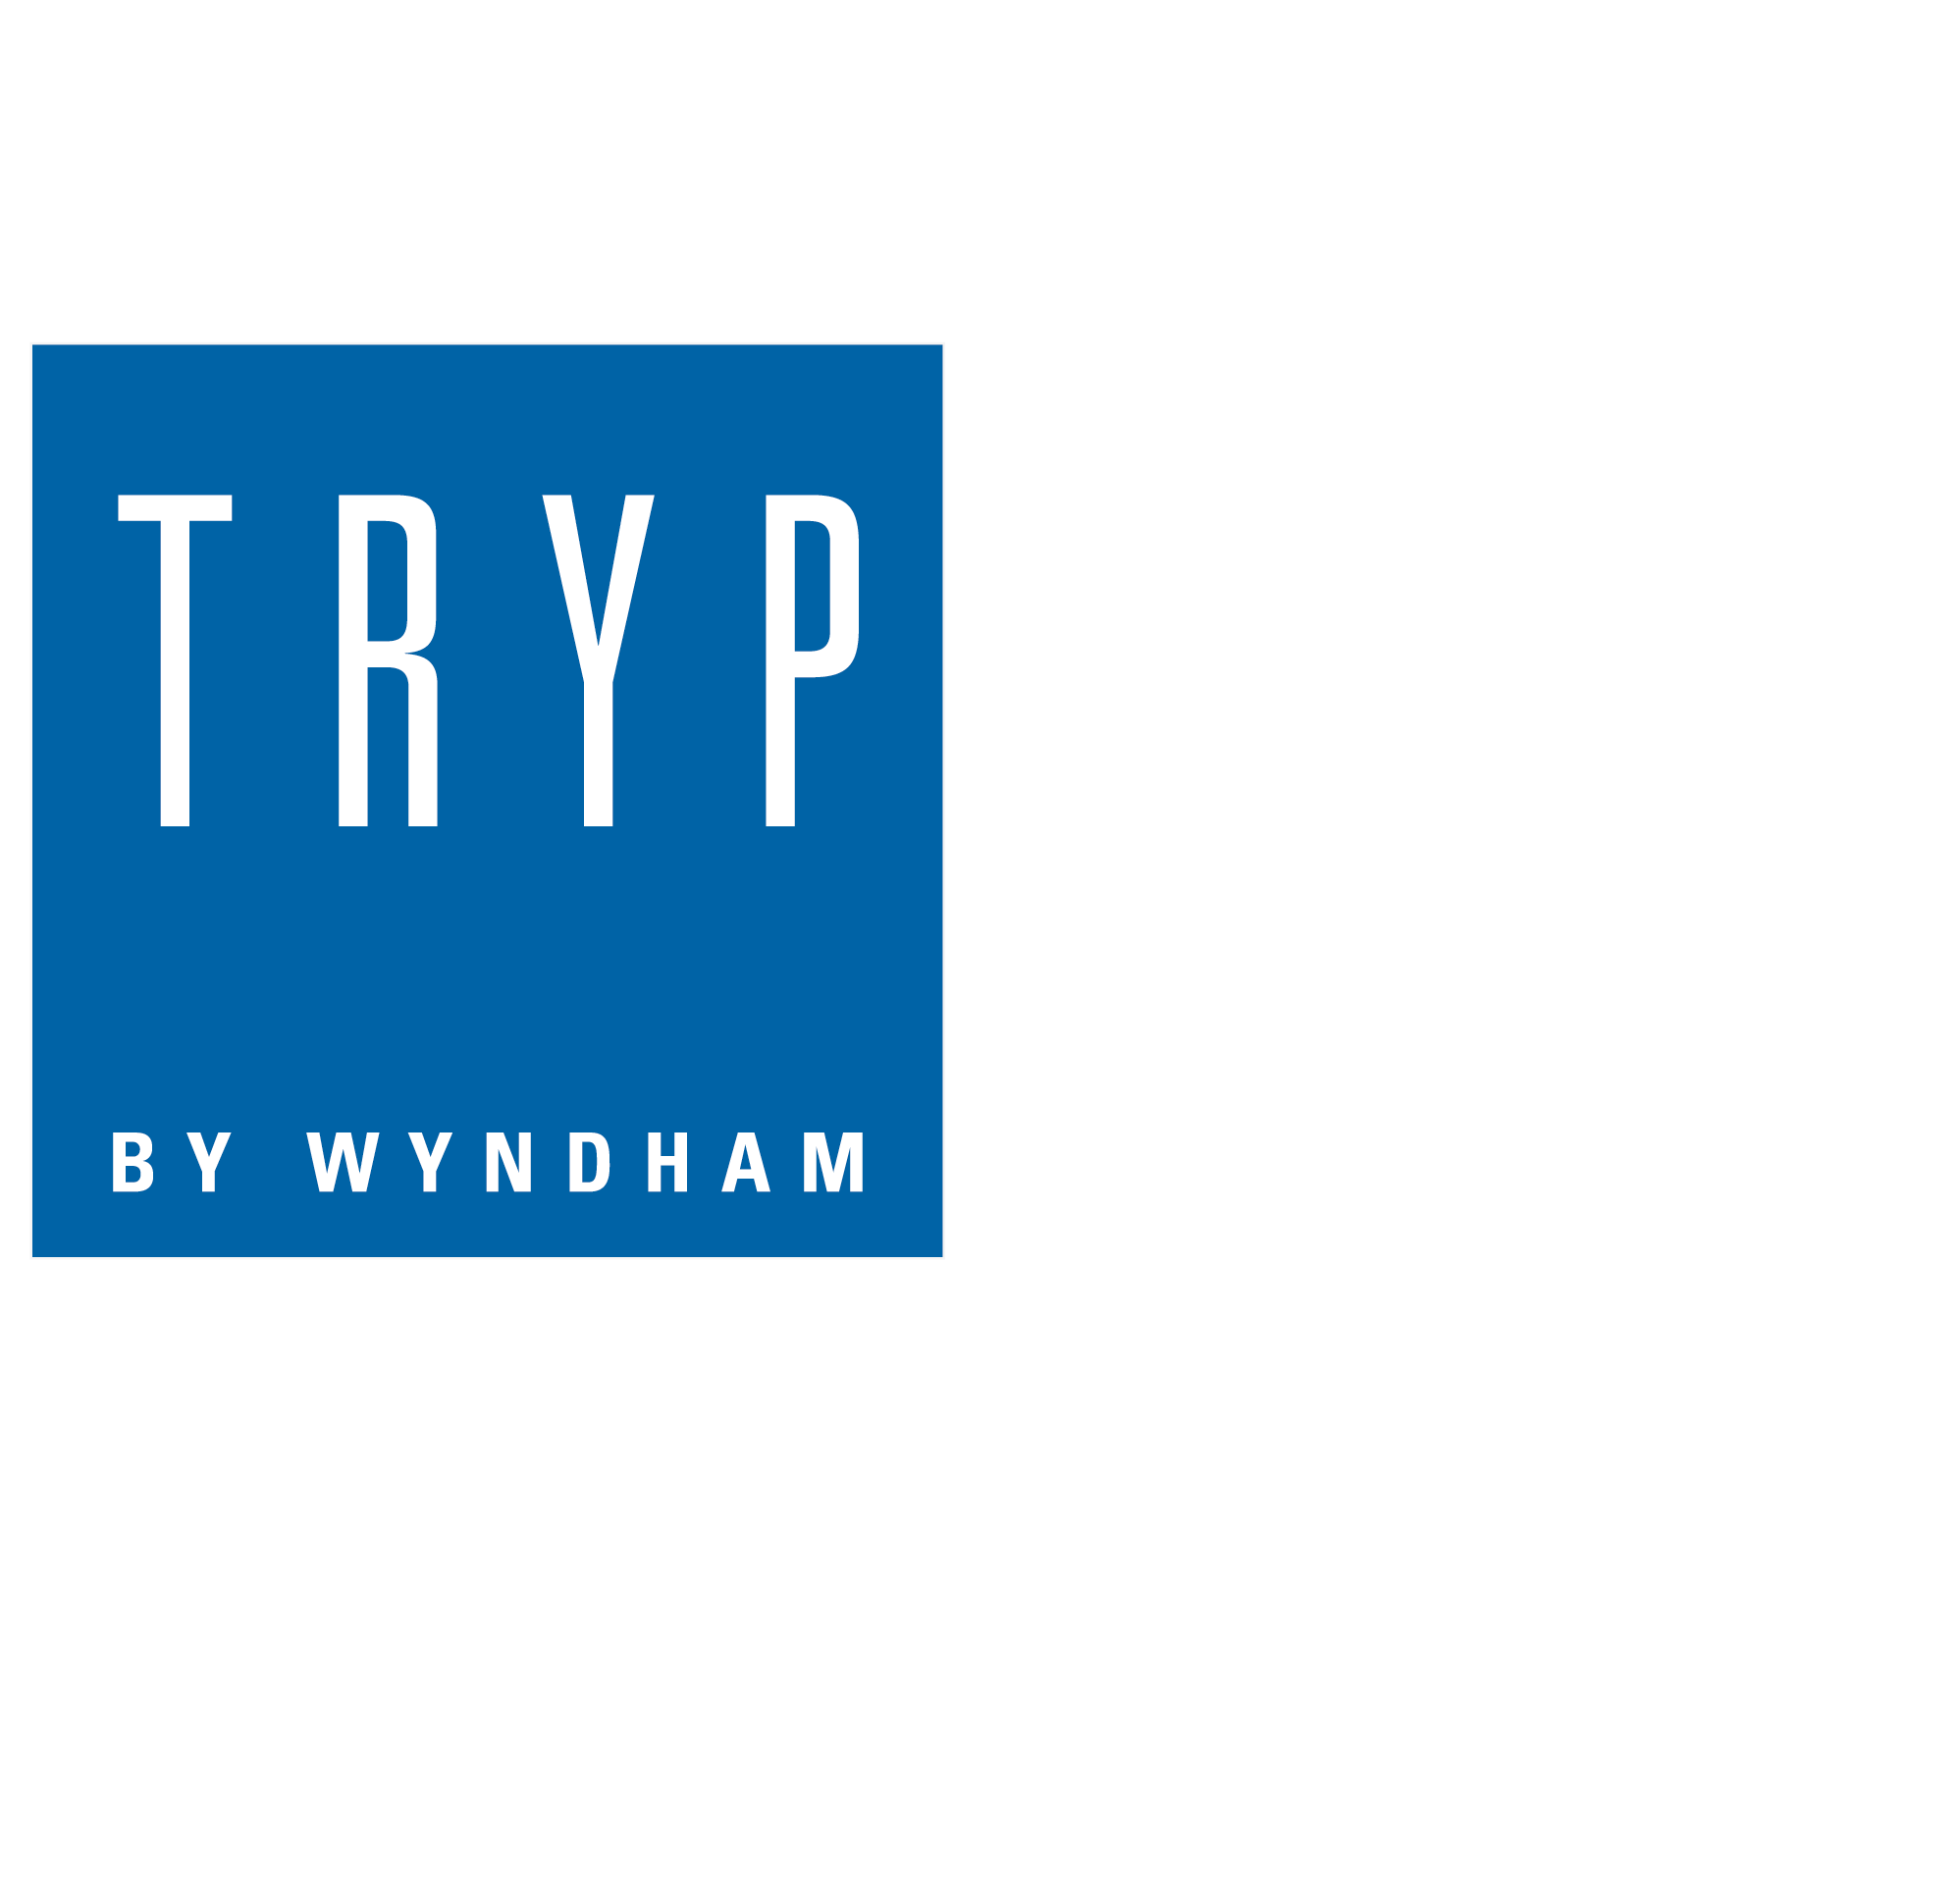 TRYP by Wyndham Bogotá Usaquén